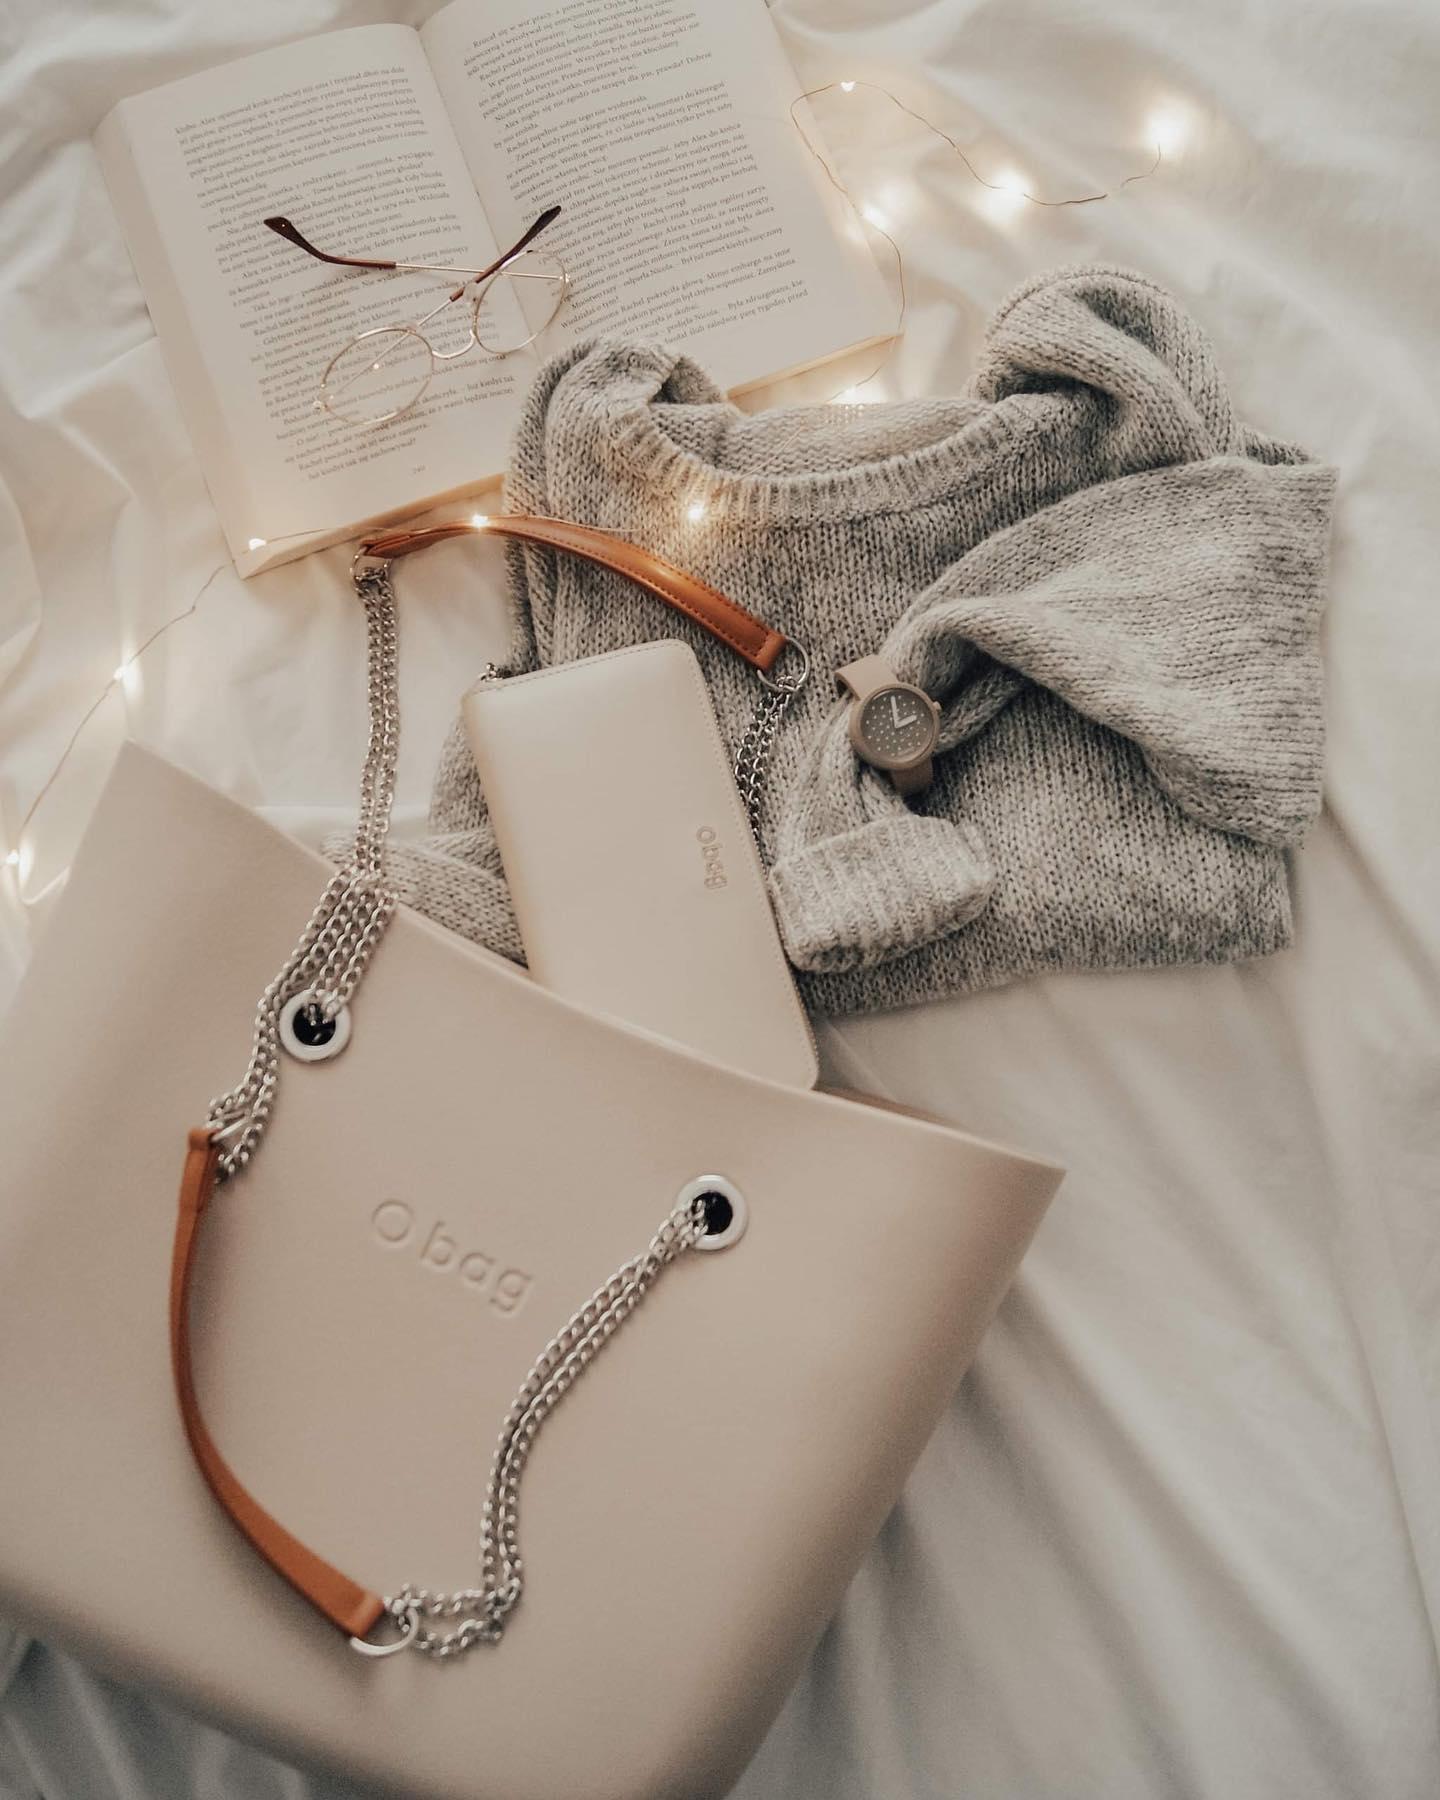 O bag social